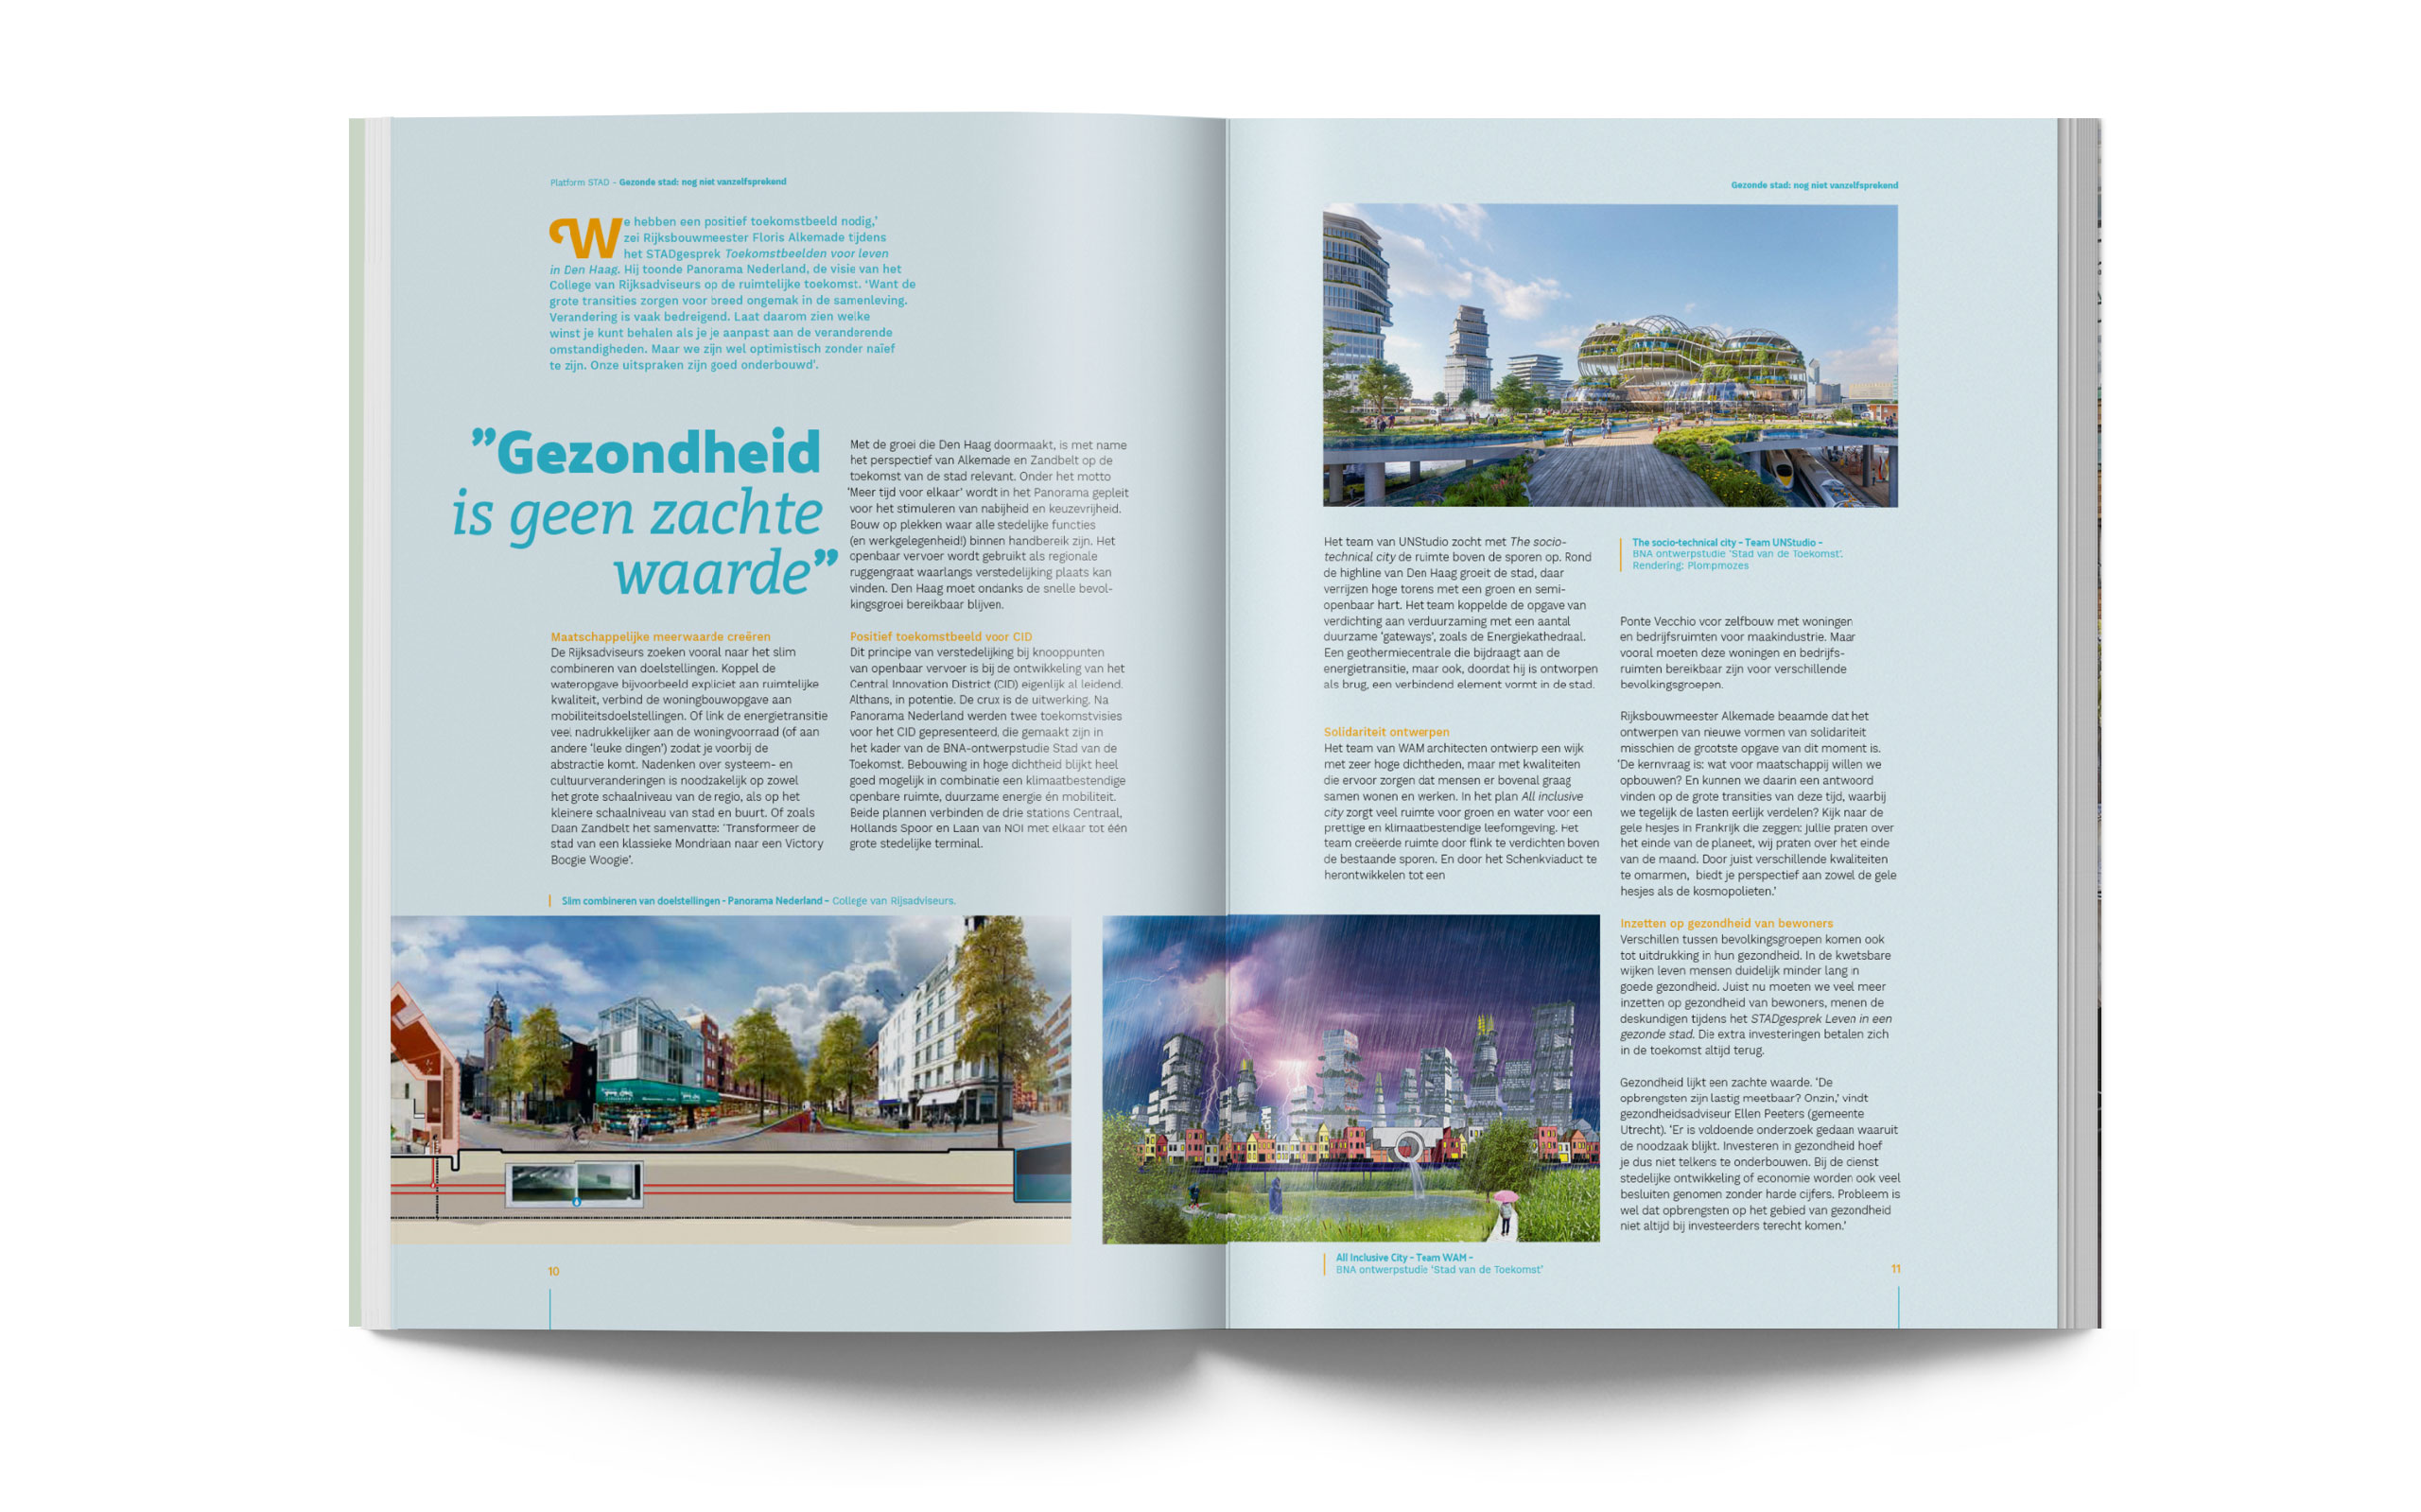 Magazine over stadsverdichting